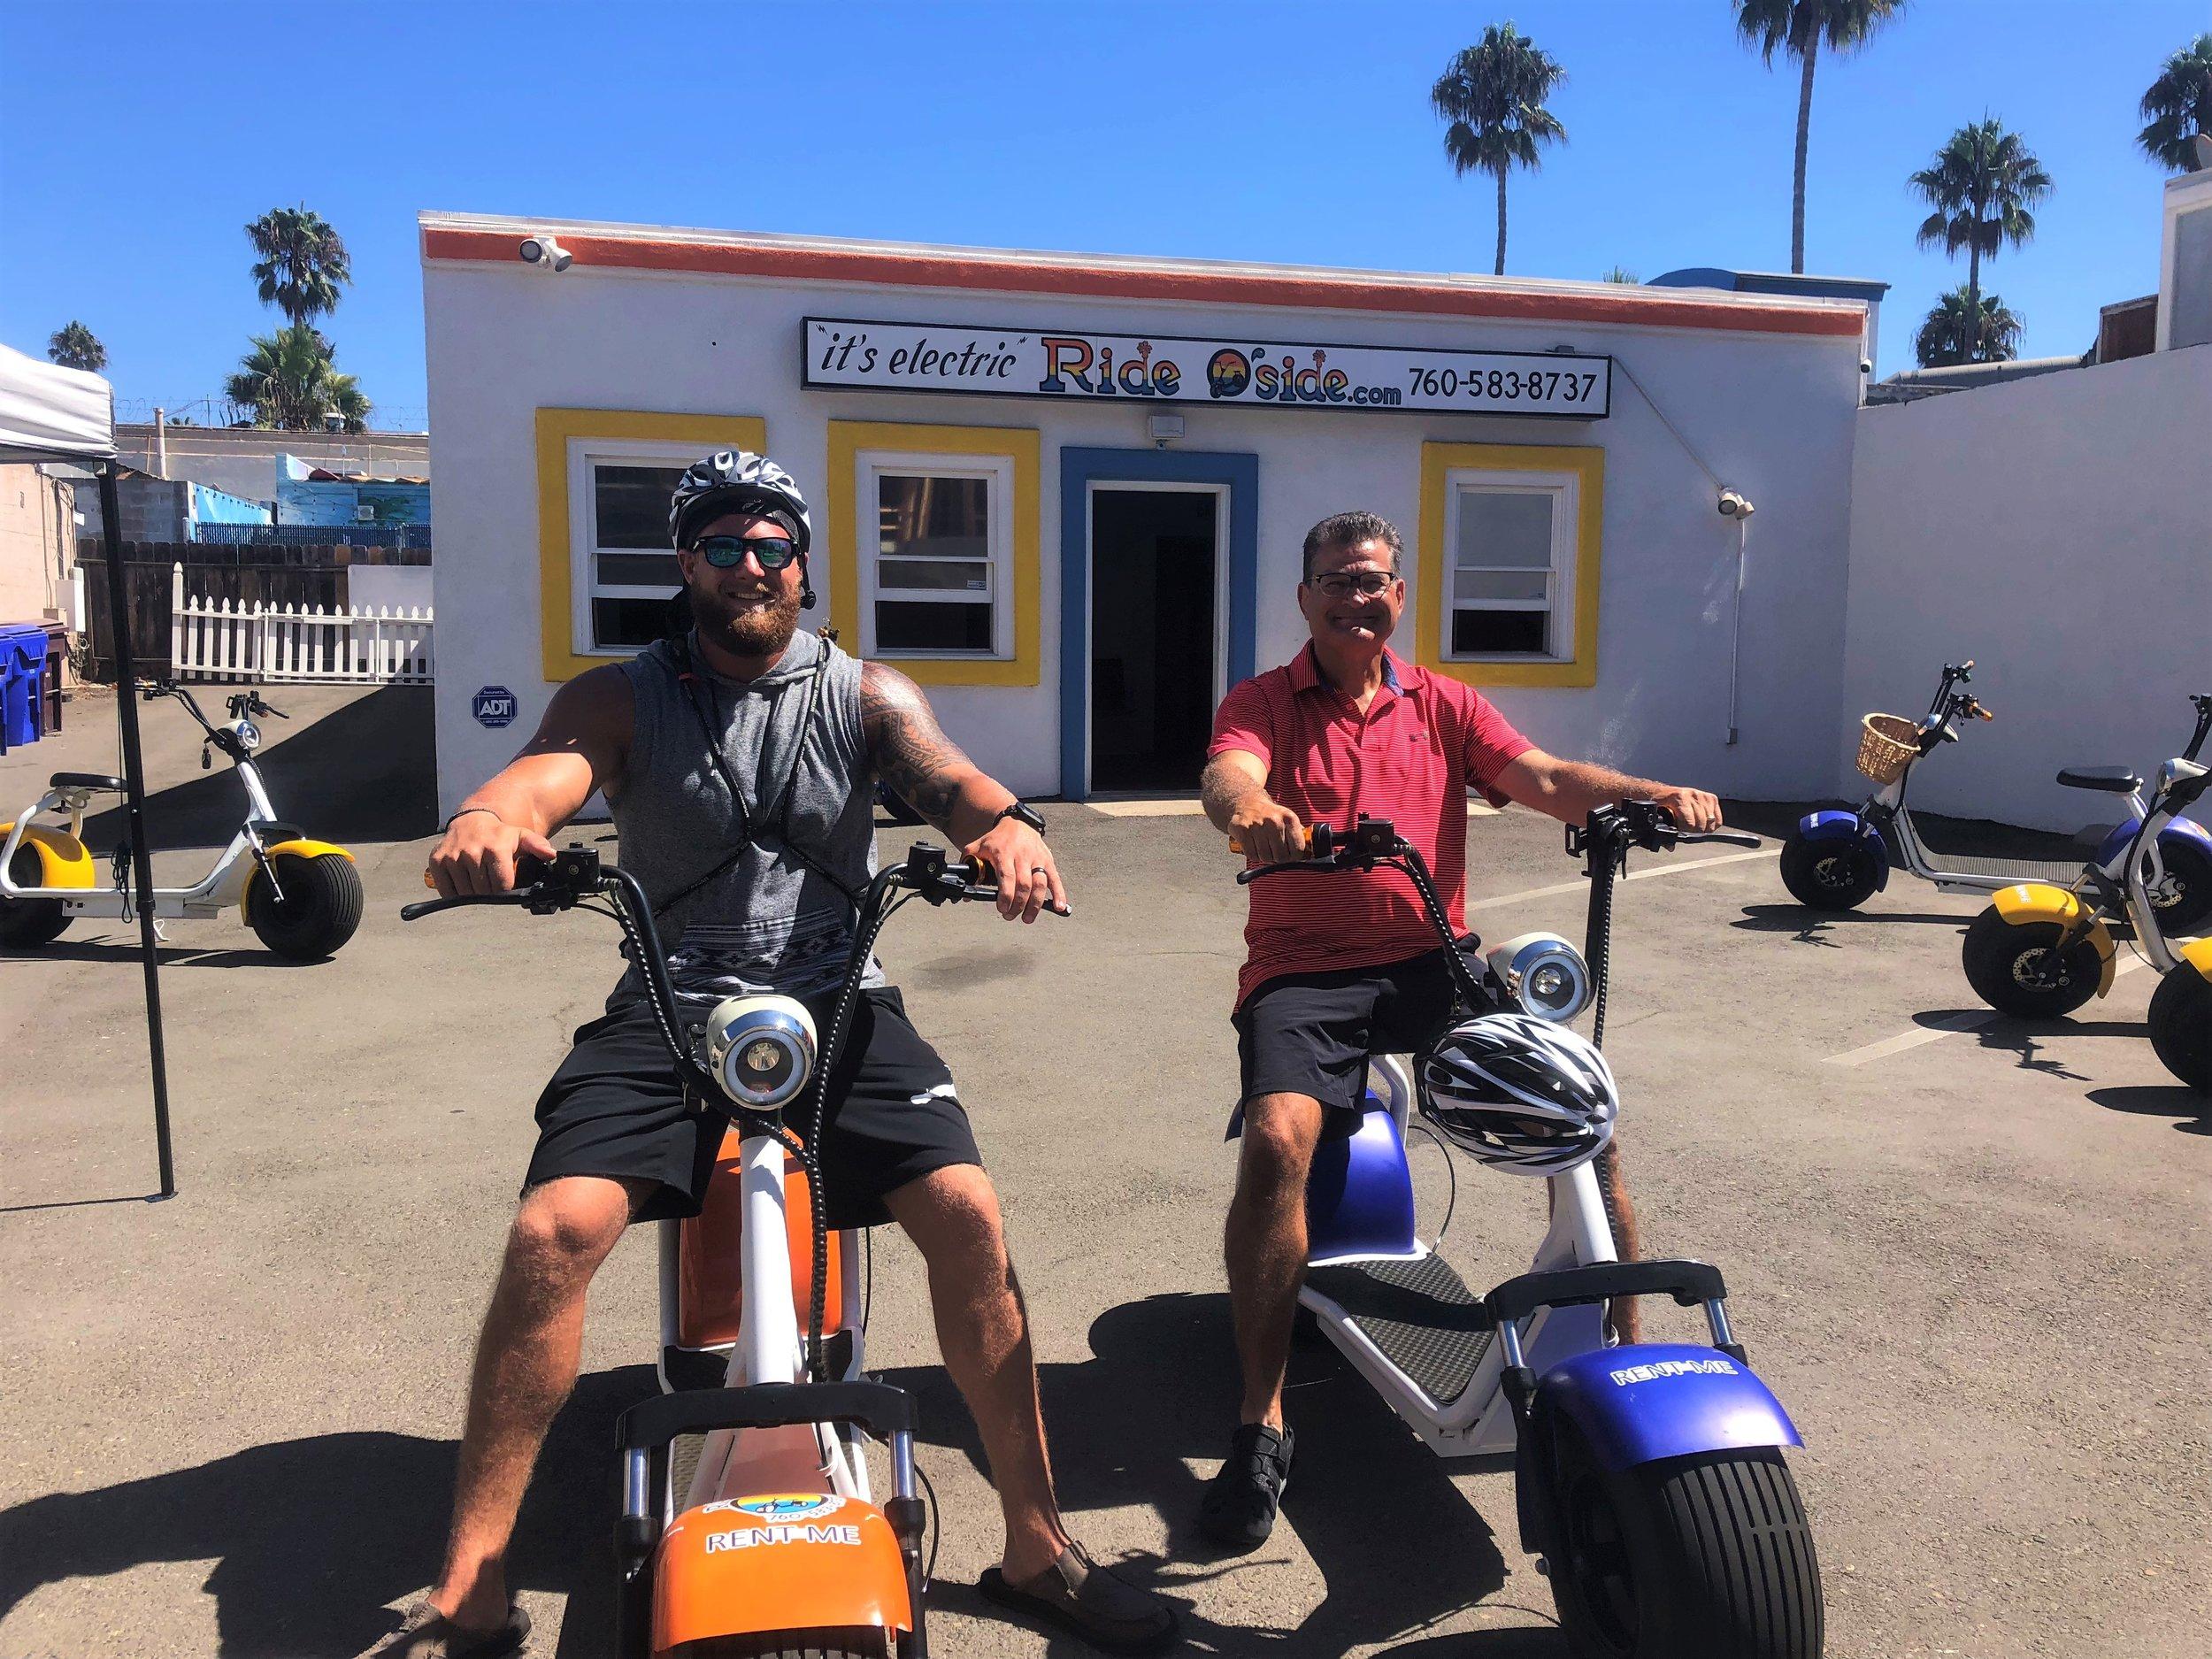 cruise san diego north county bike rentals.JPG